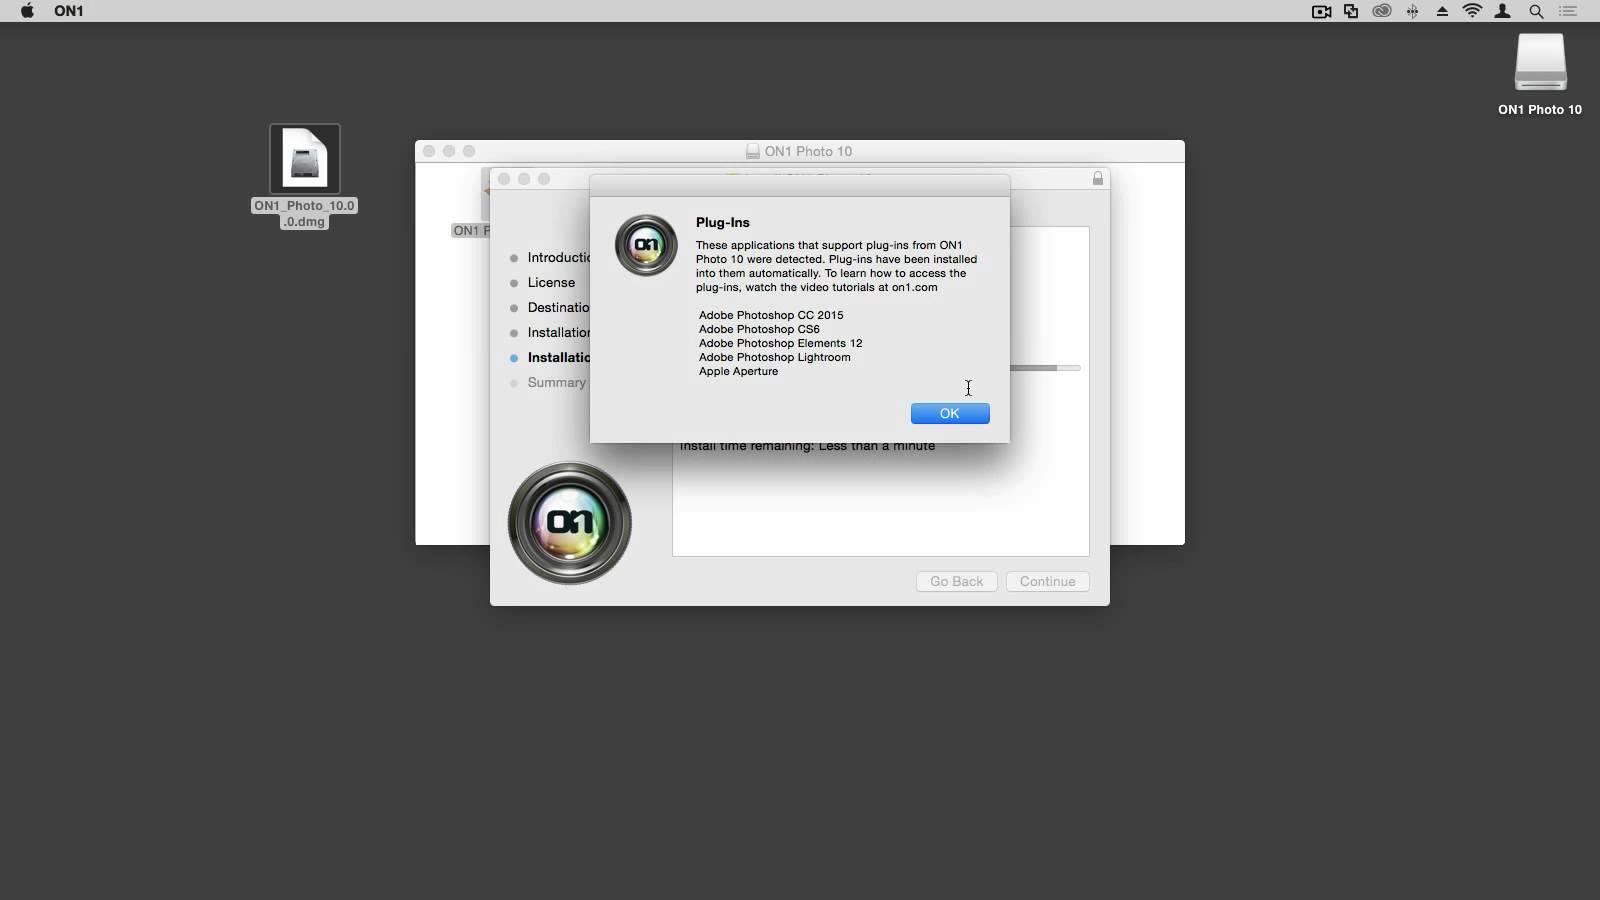 ON1 Photo RAW mac